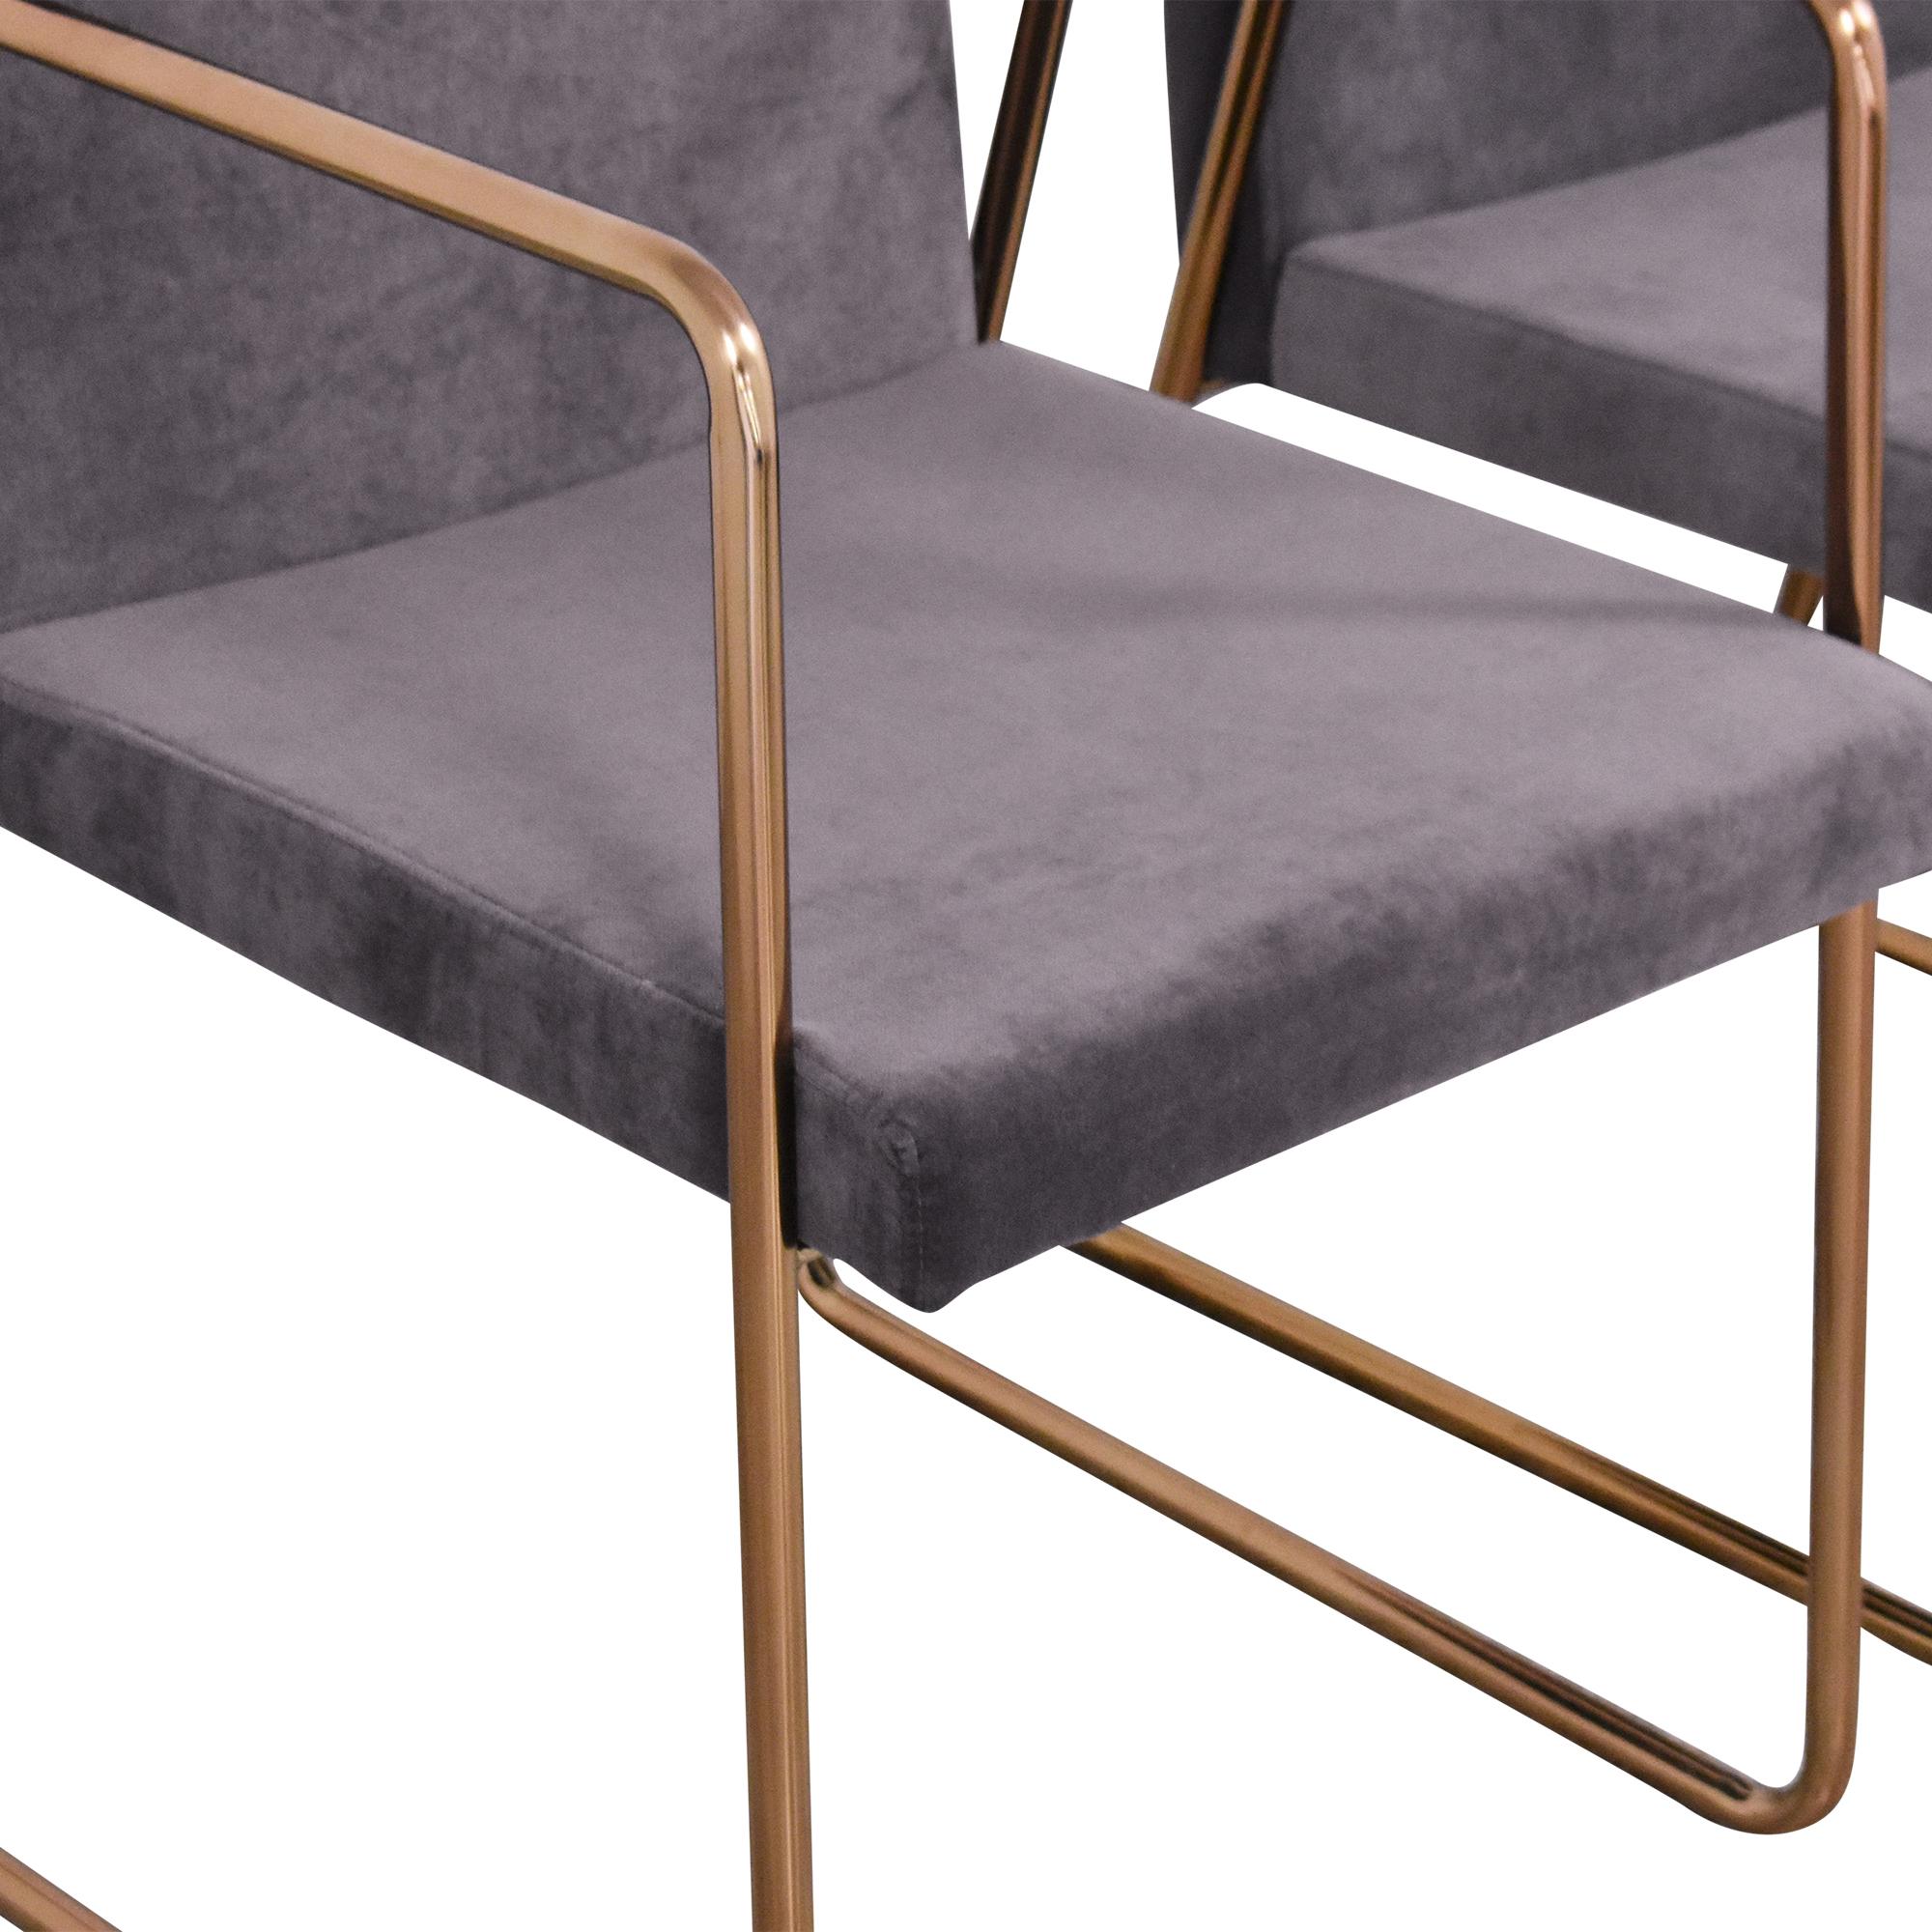 CB2 CB2 Rouka Chairs on sale